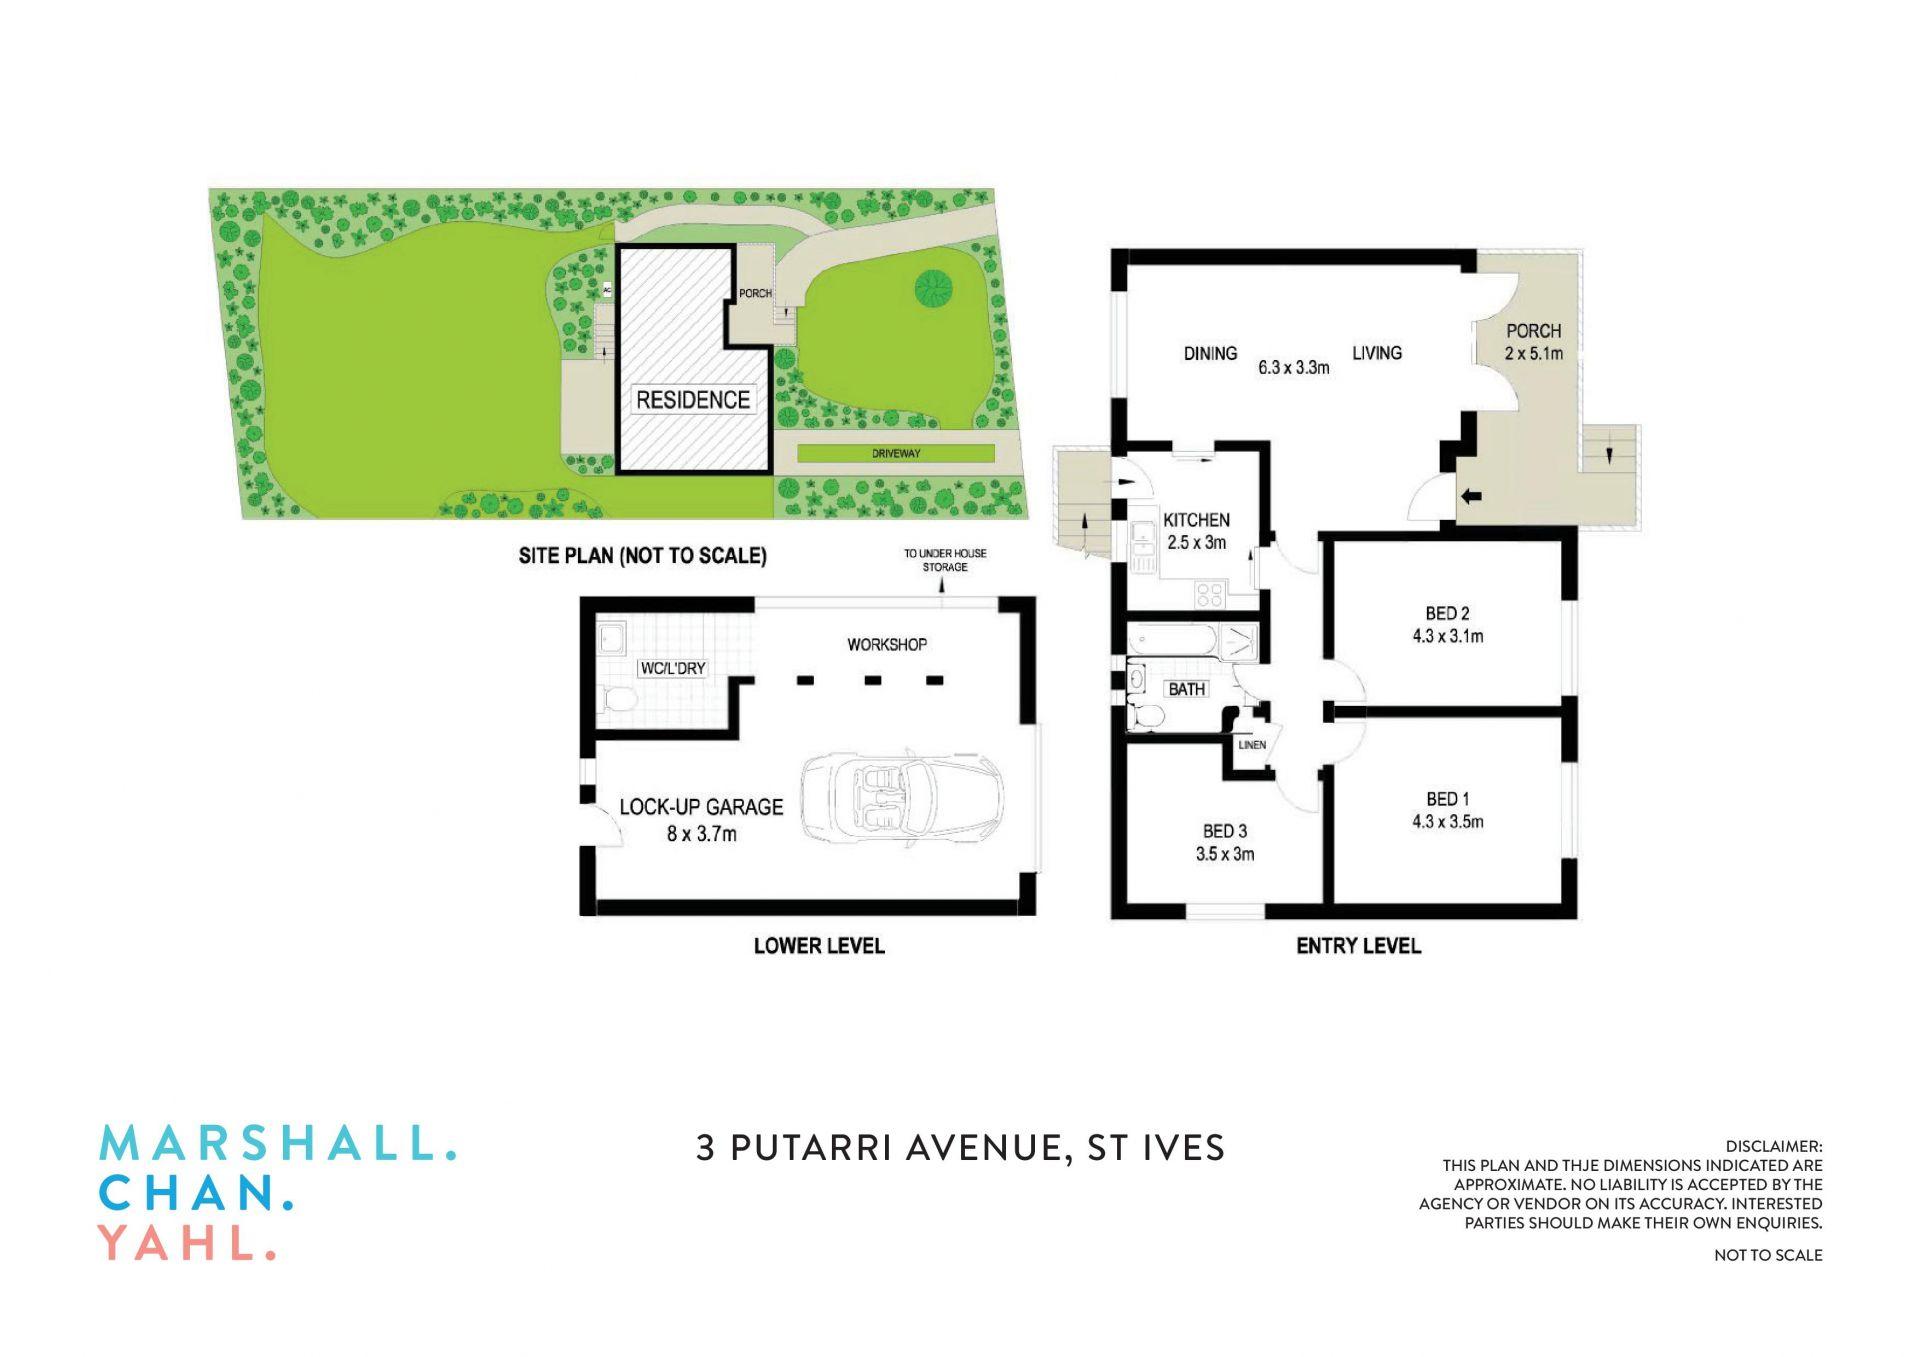 3 Putarri Avenue St Ives 2075